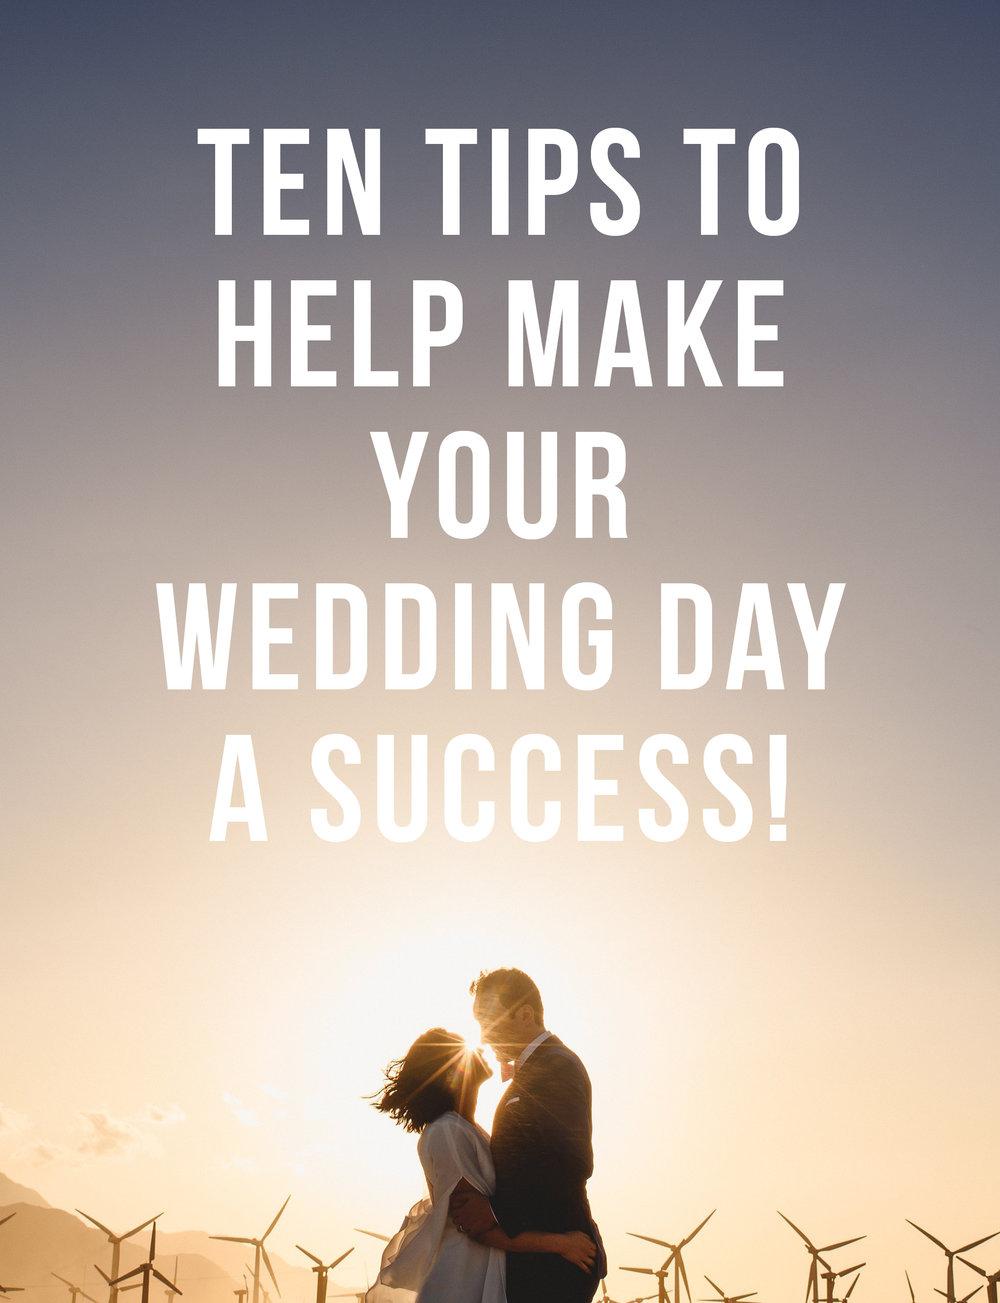 Ten Tips To Help Make Your Wedding Day A Success!.jpg